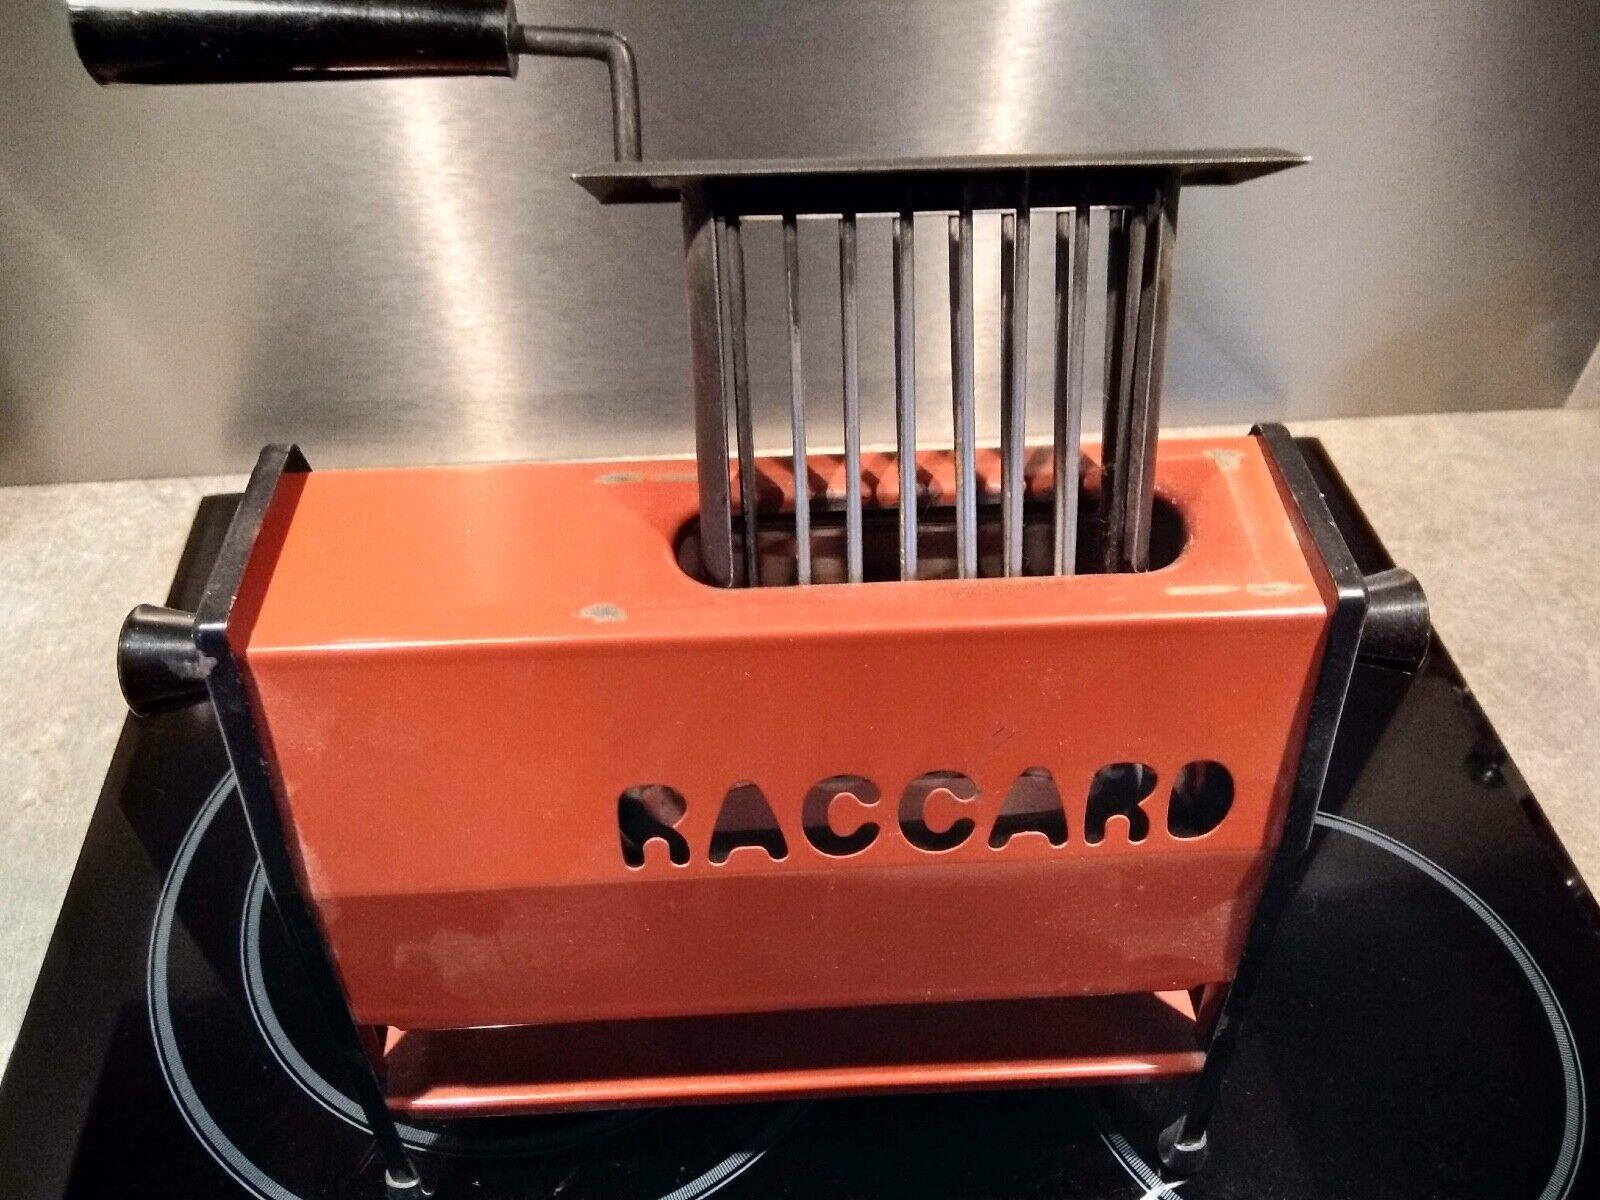 Appareil à raclette Raccard A.SCHARER